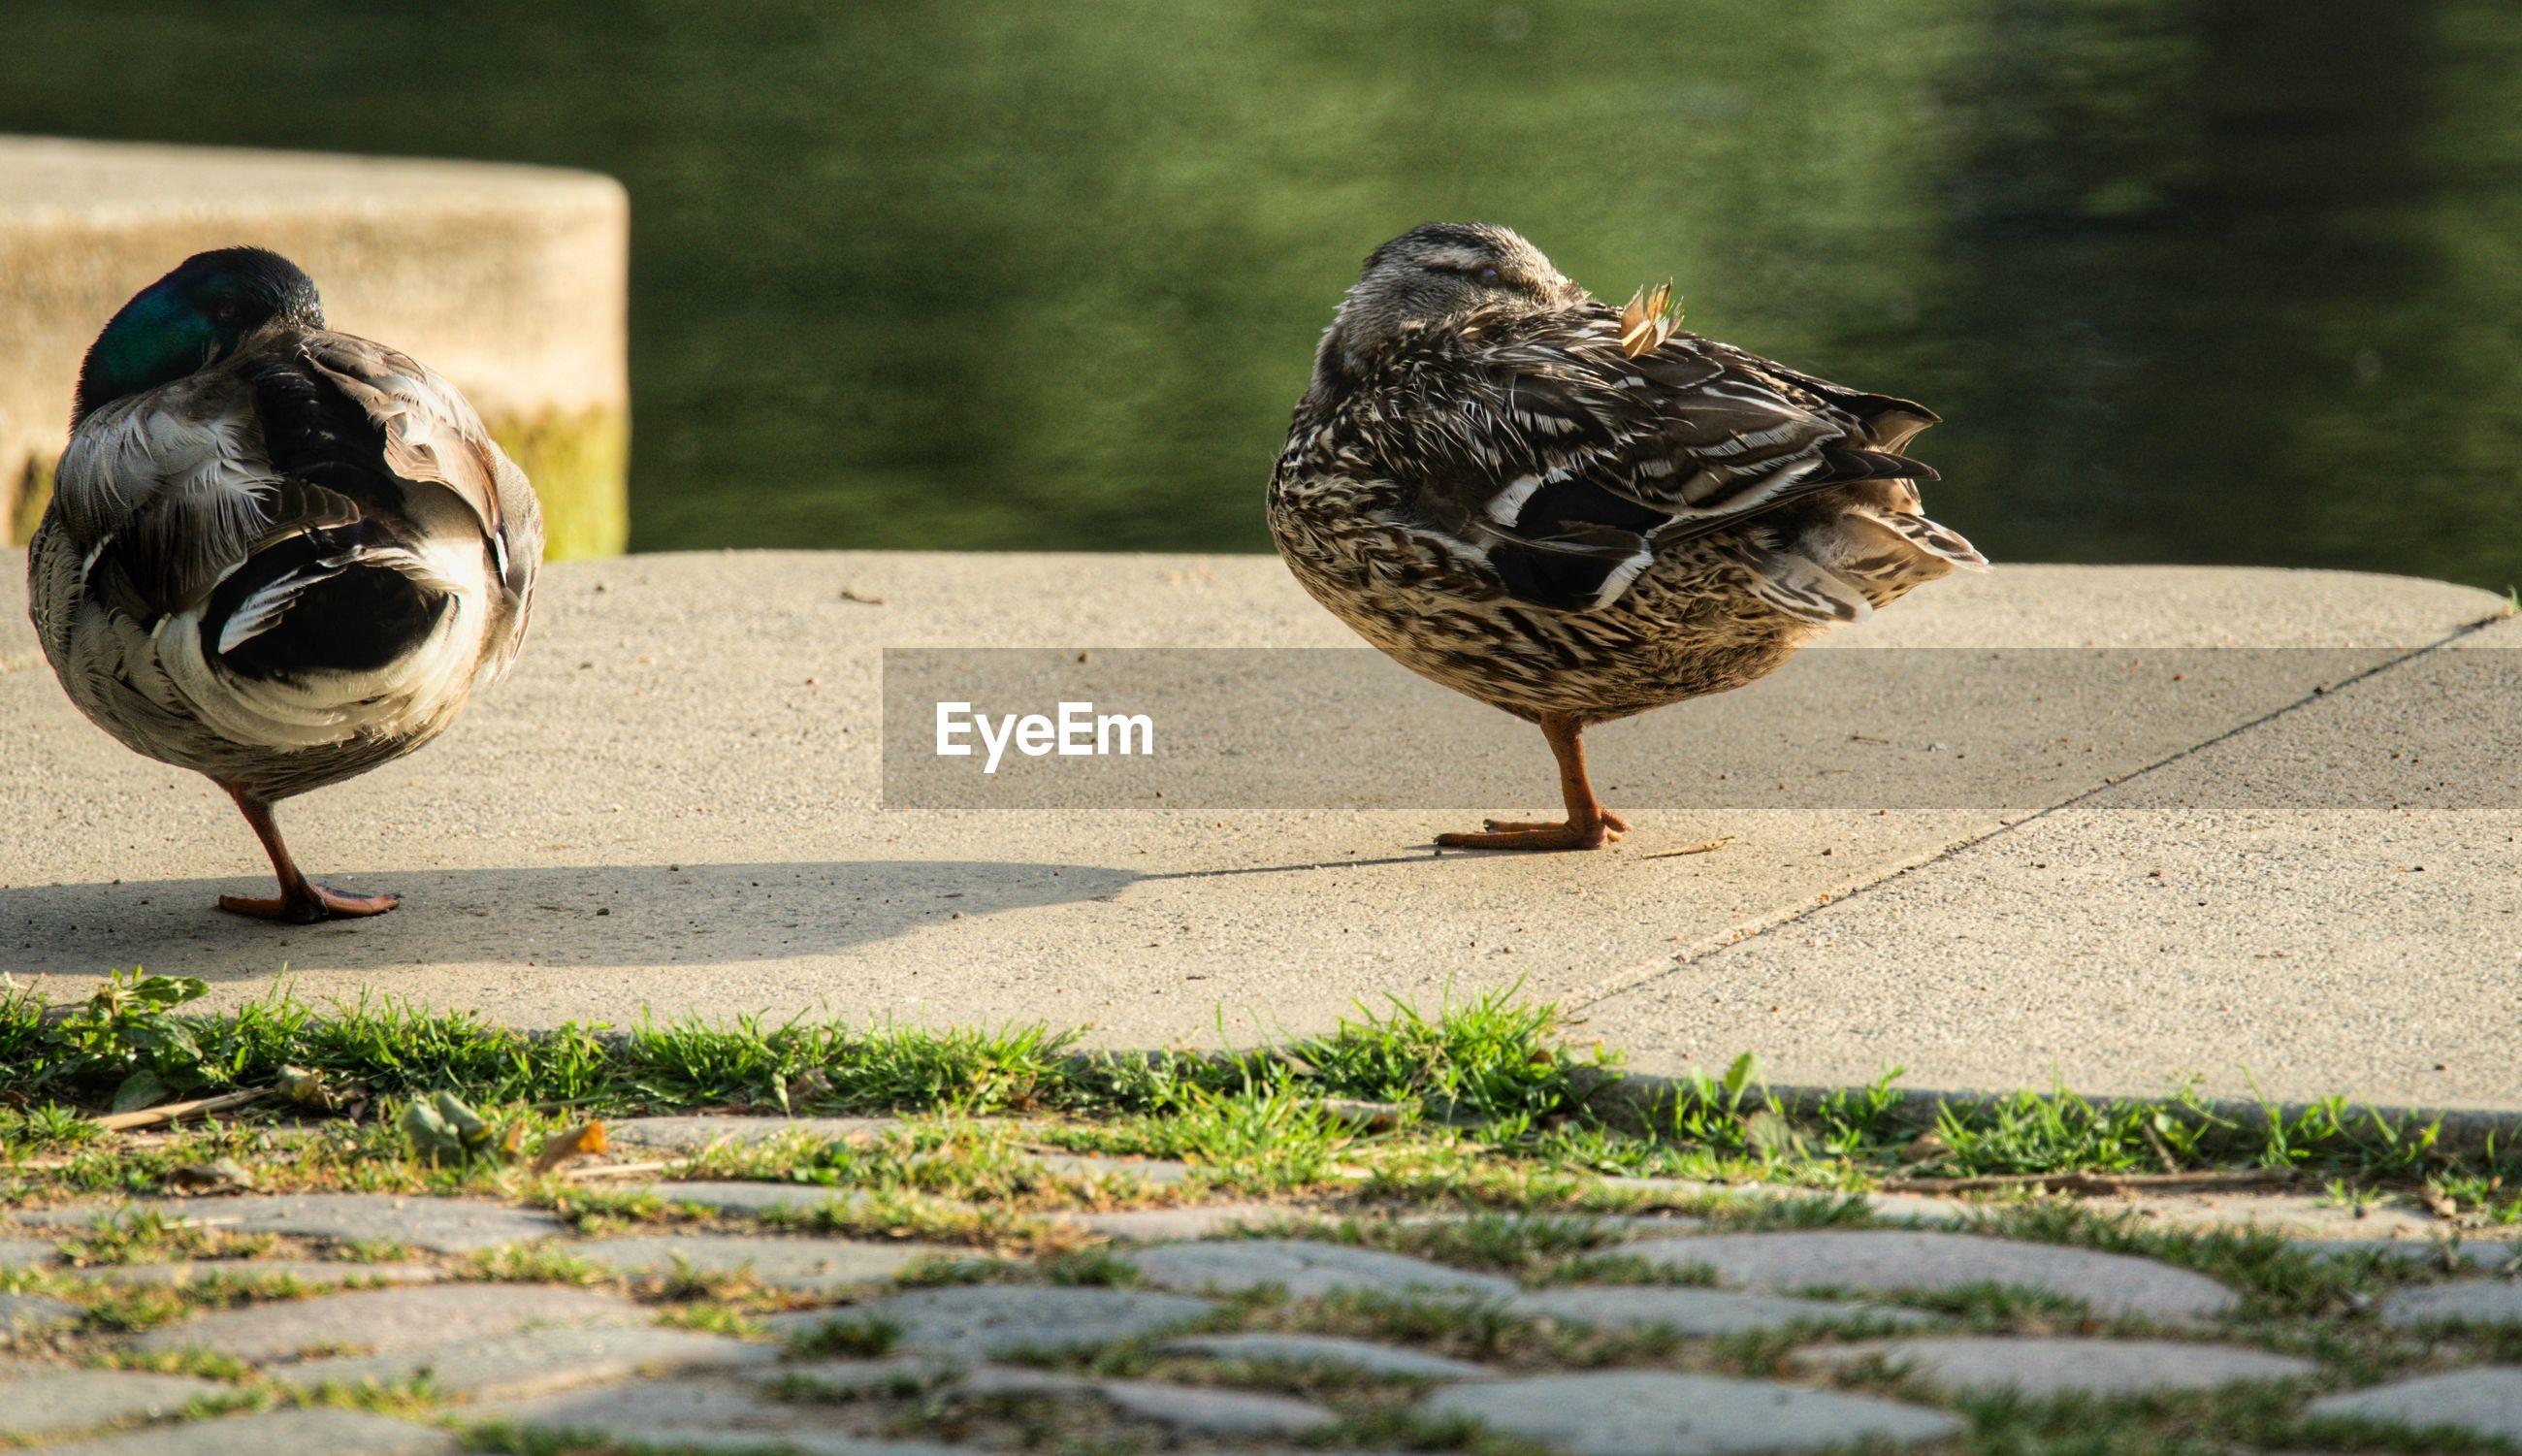 BIRD PERCHING ON THE FOOTPATH